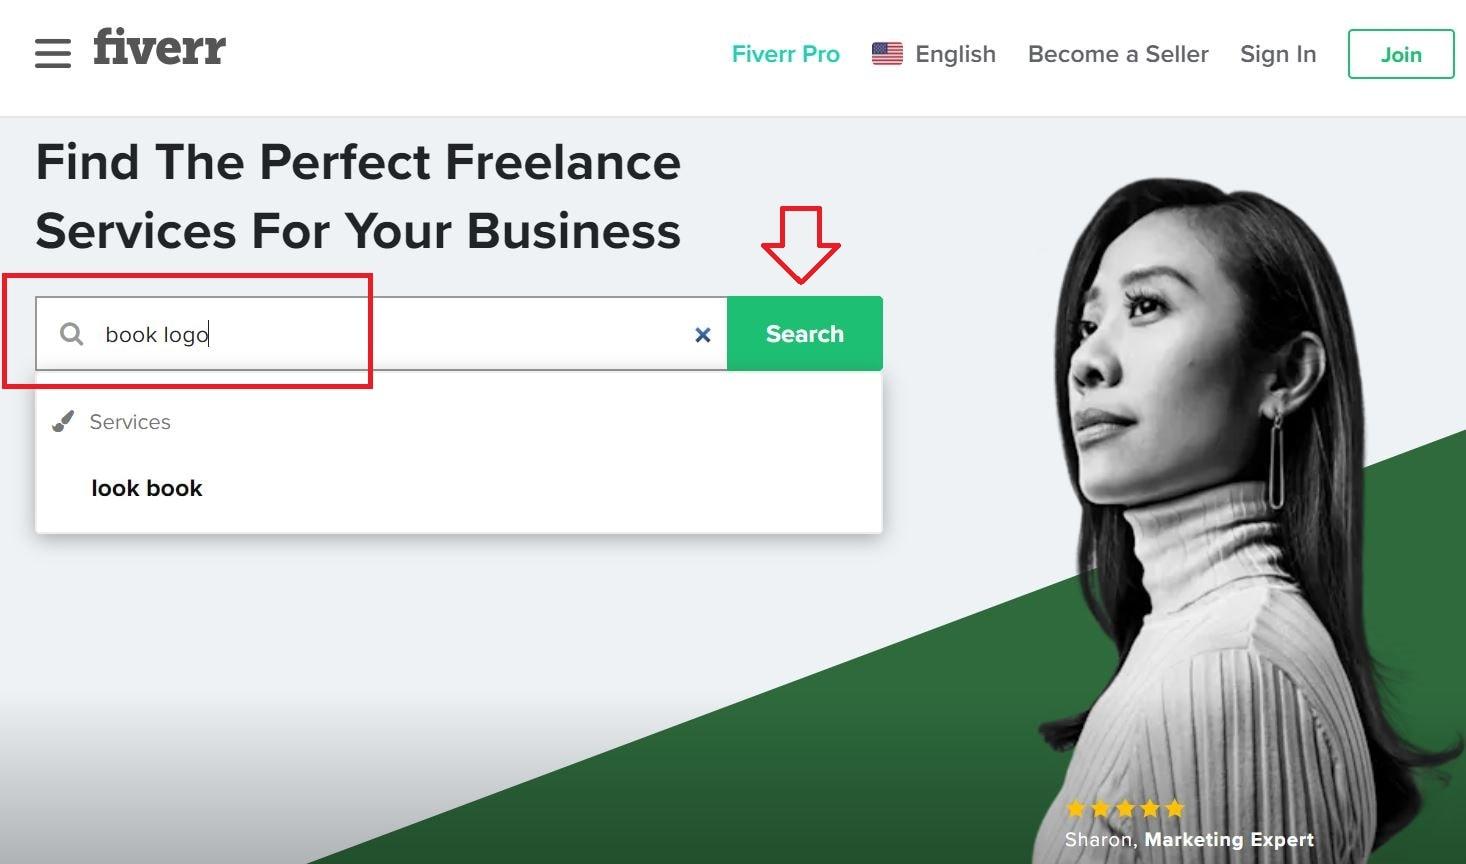 Fiverr screenshot - Homepage book logo search